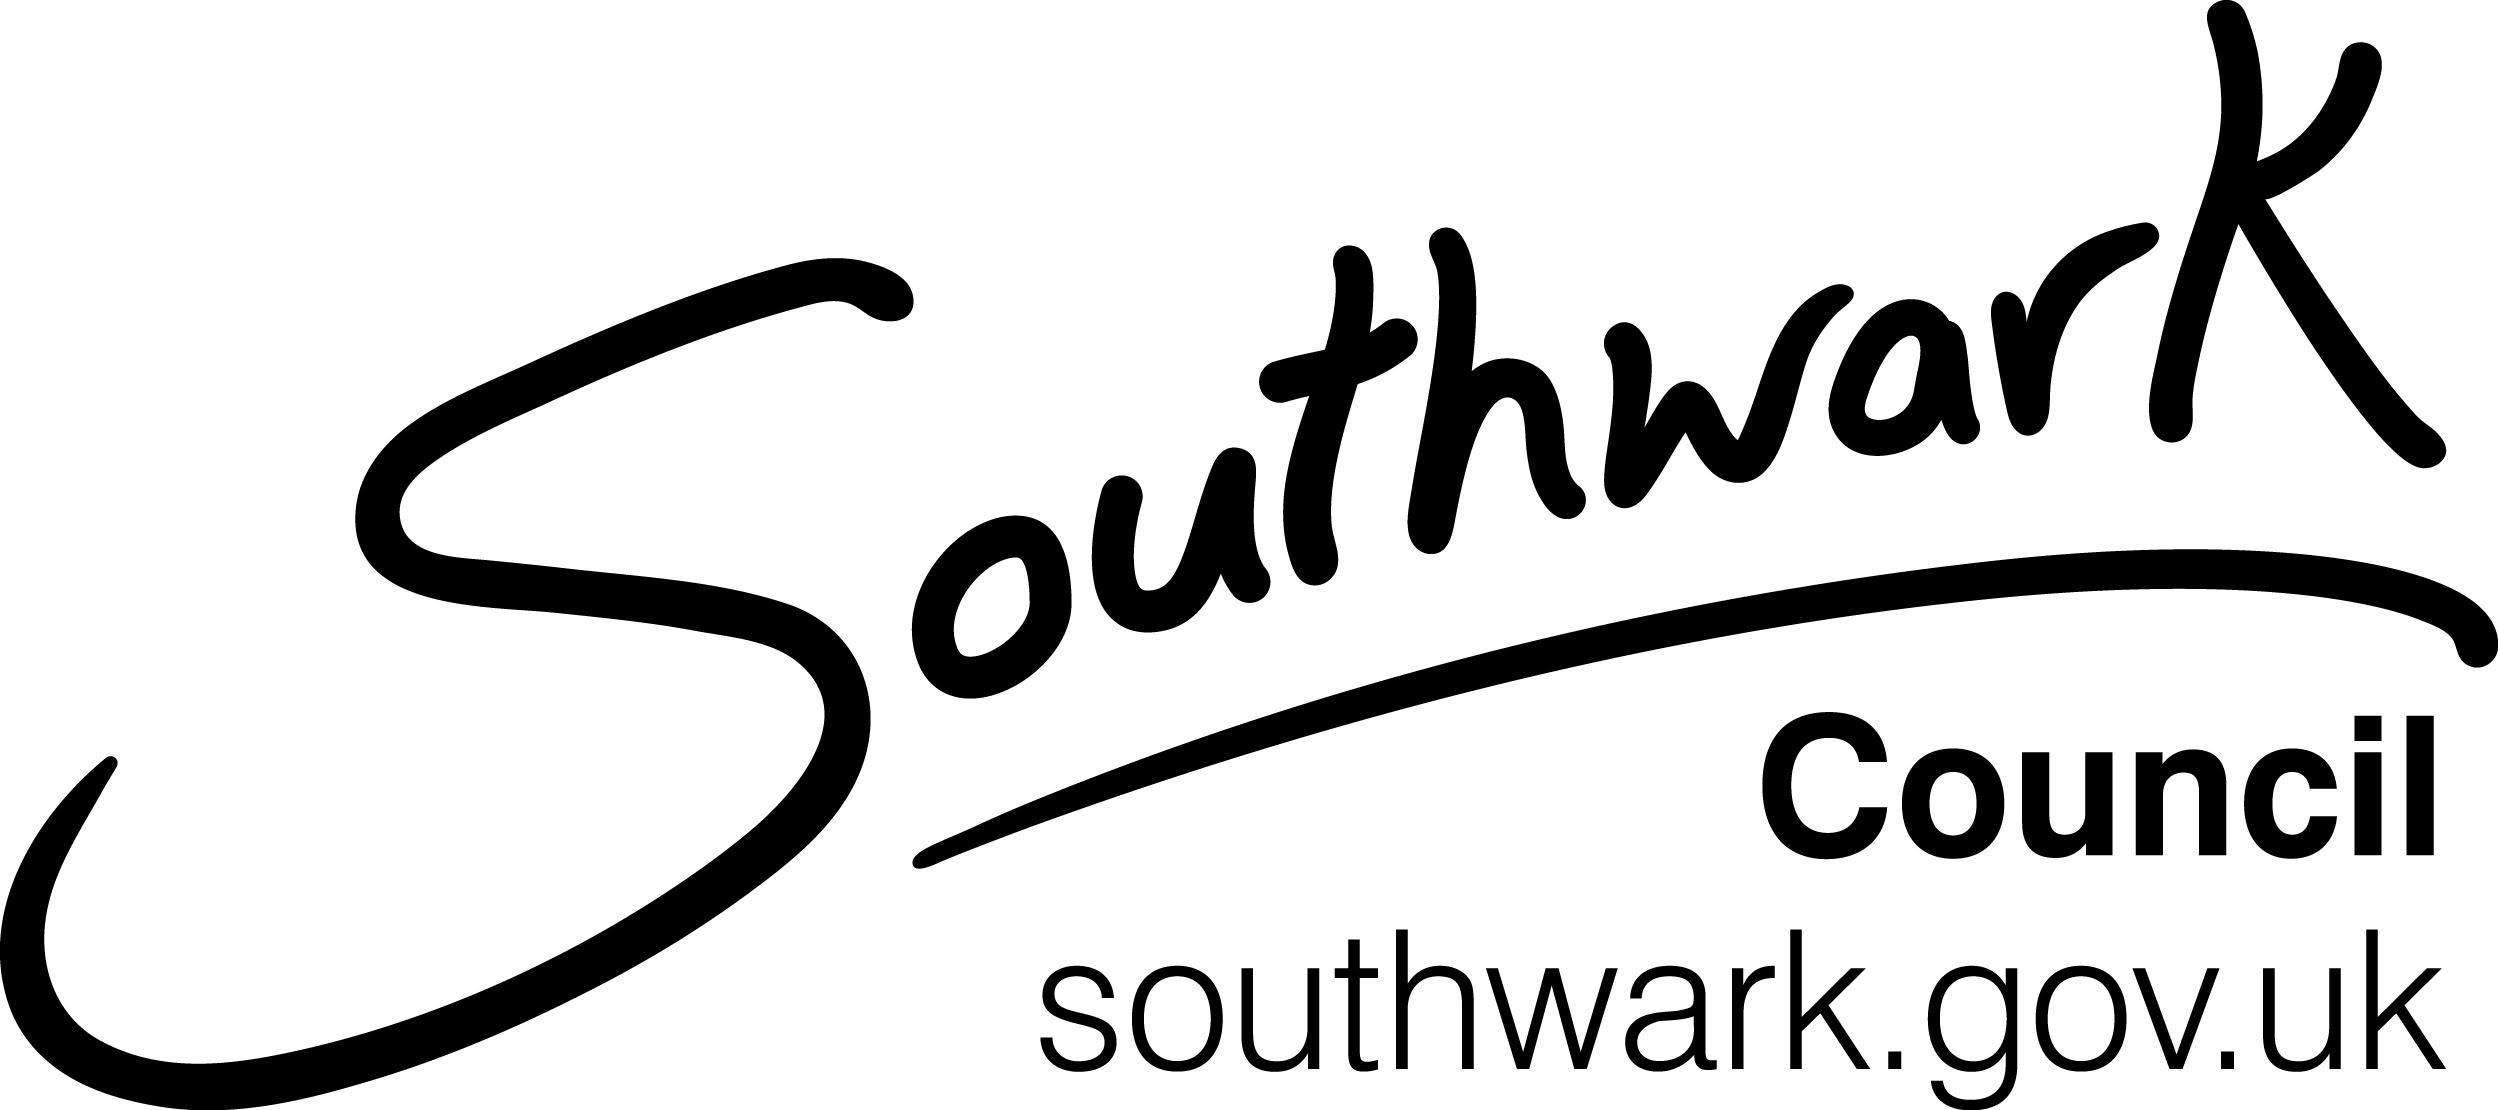 Southwark_logo_(black).png